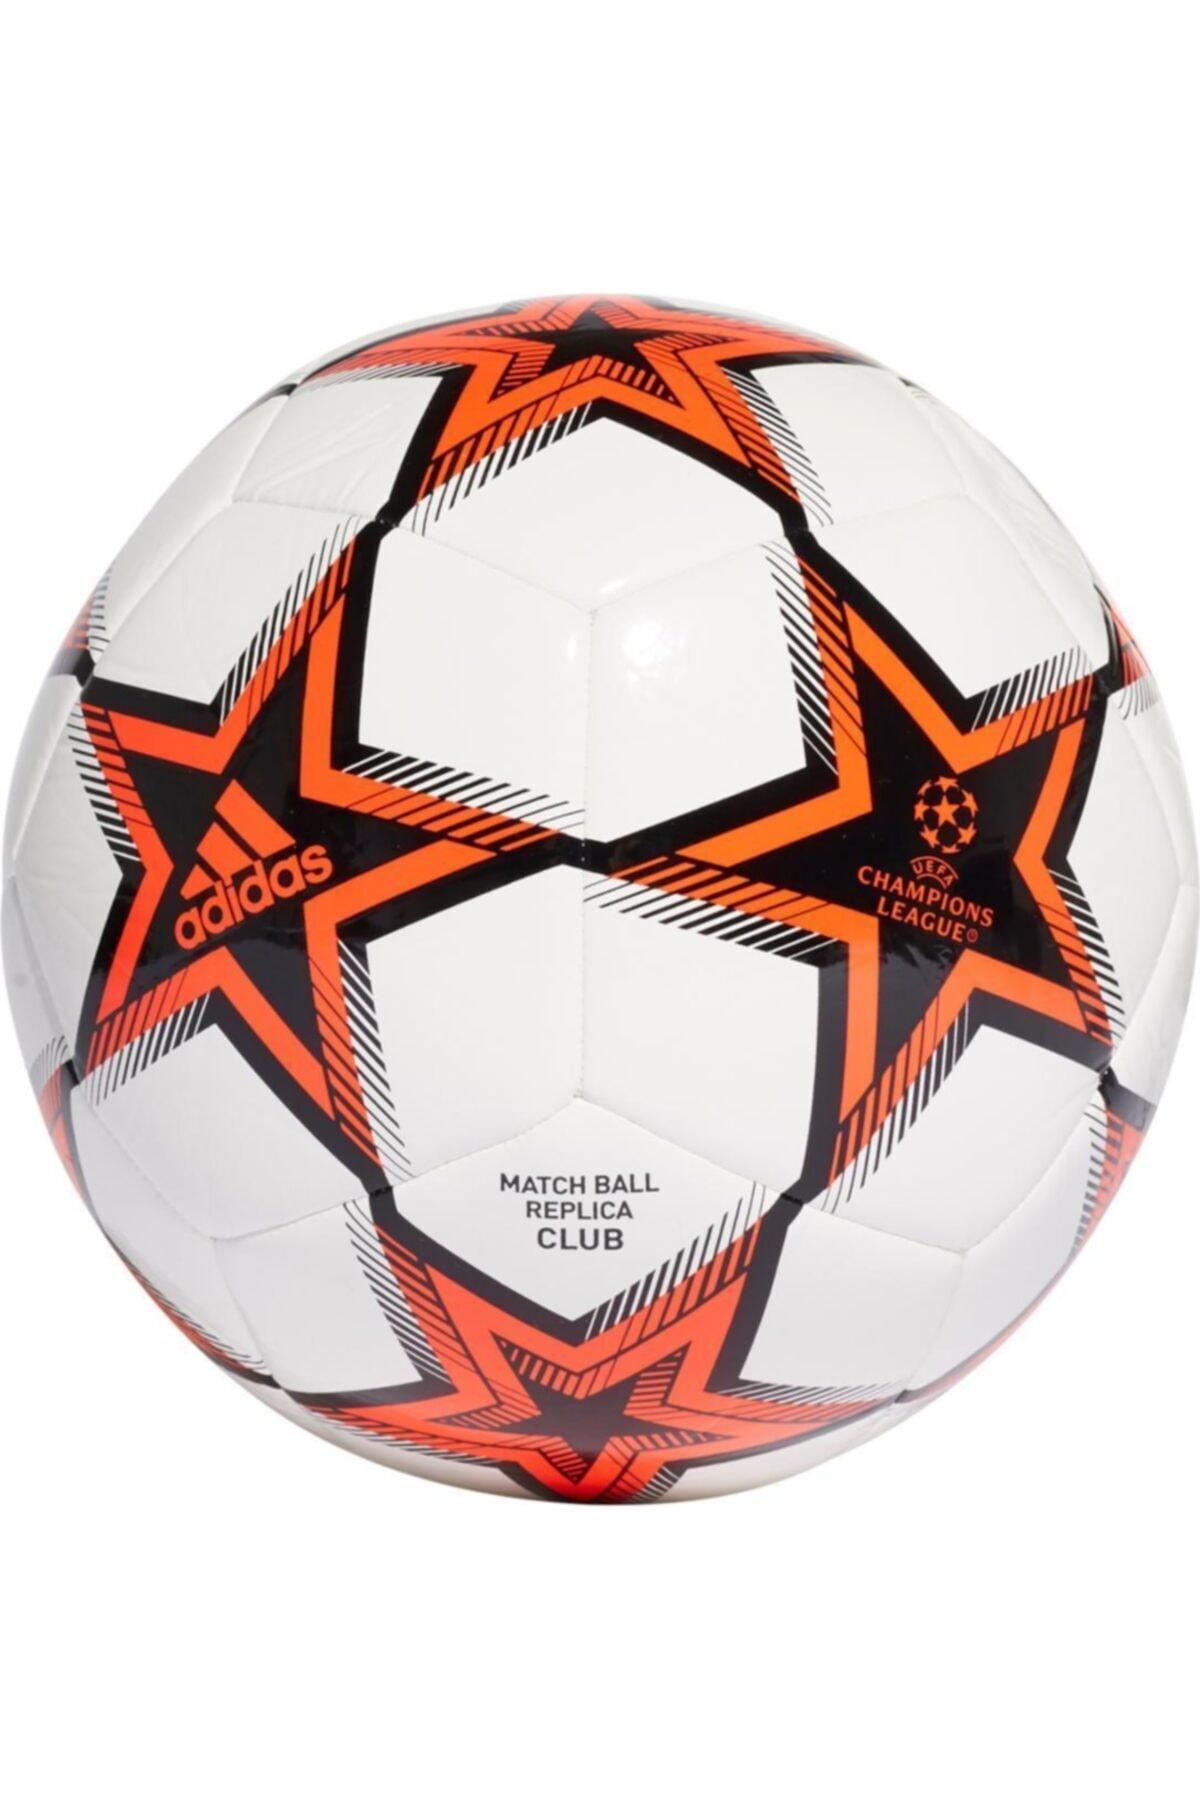 Gt7789 Uefa Şampiyonlar Ligi Club Antrenman Futbol Topu